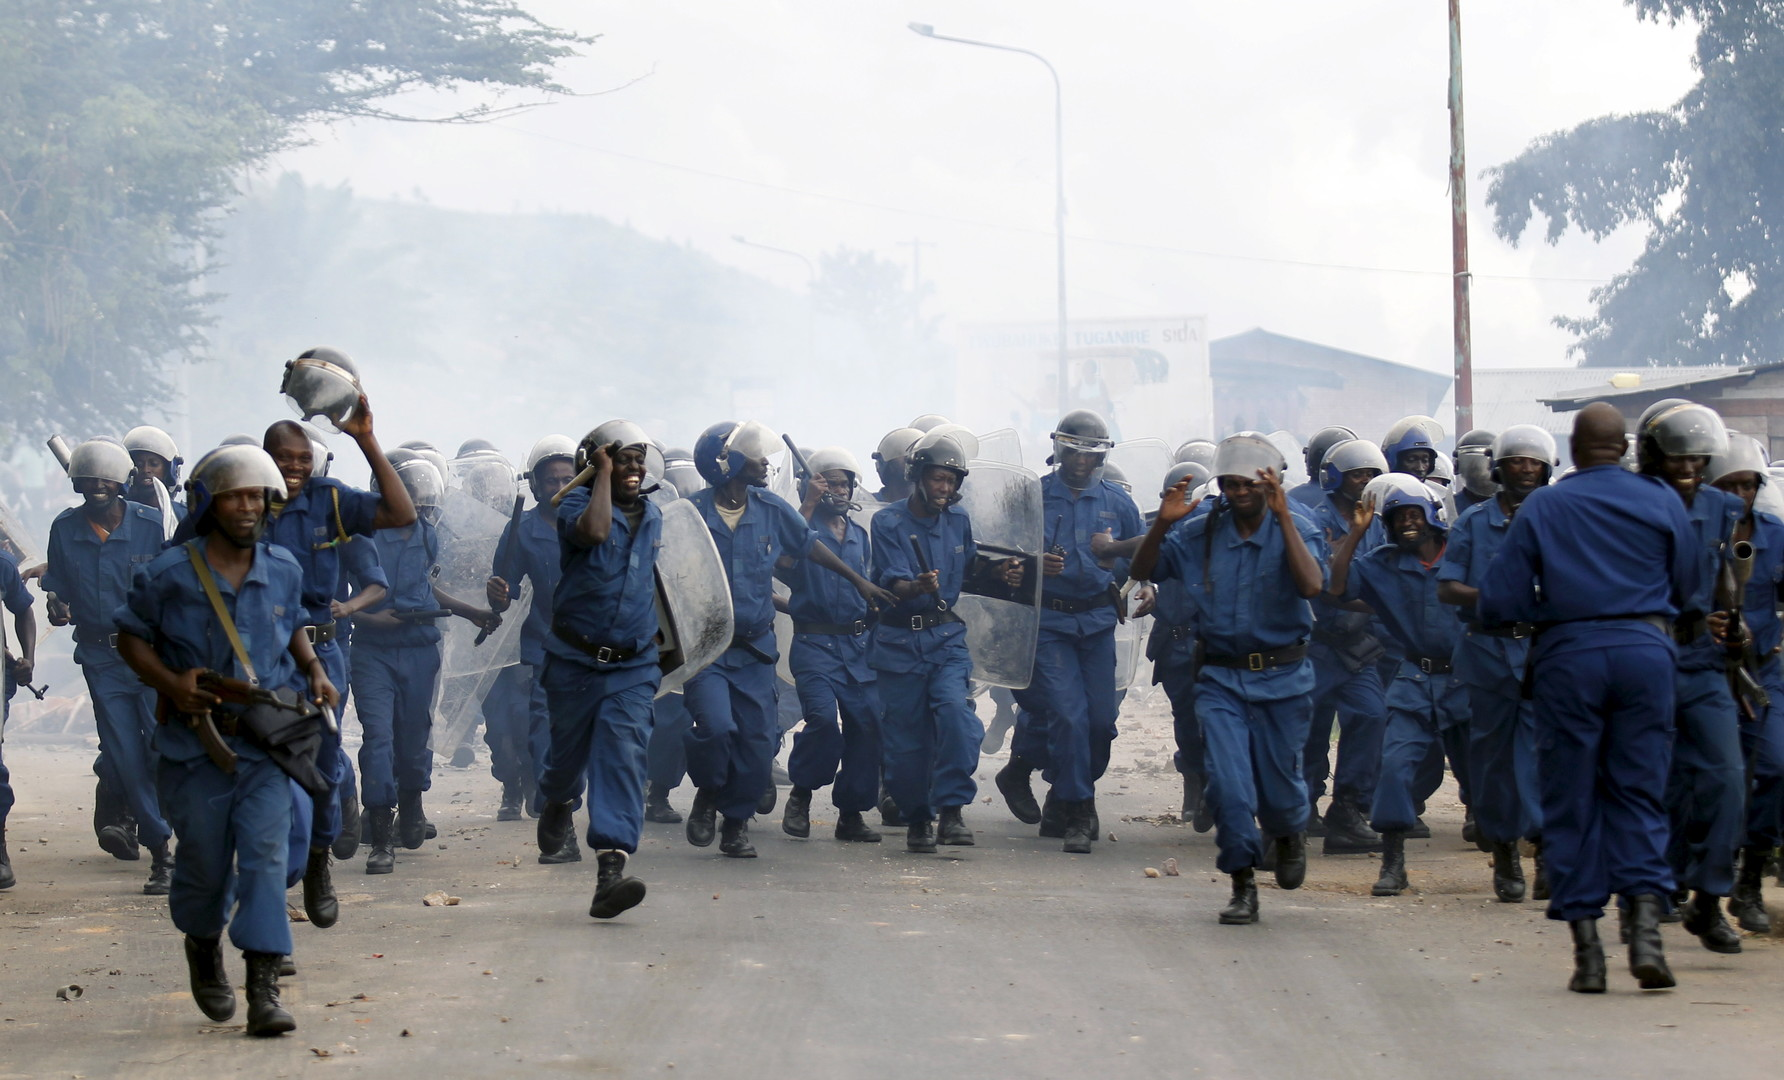 Une manifestation d'opposants au président Pierre Nkurunziza